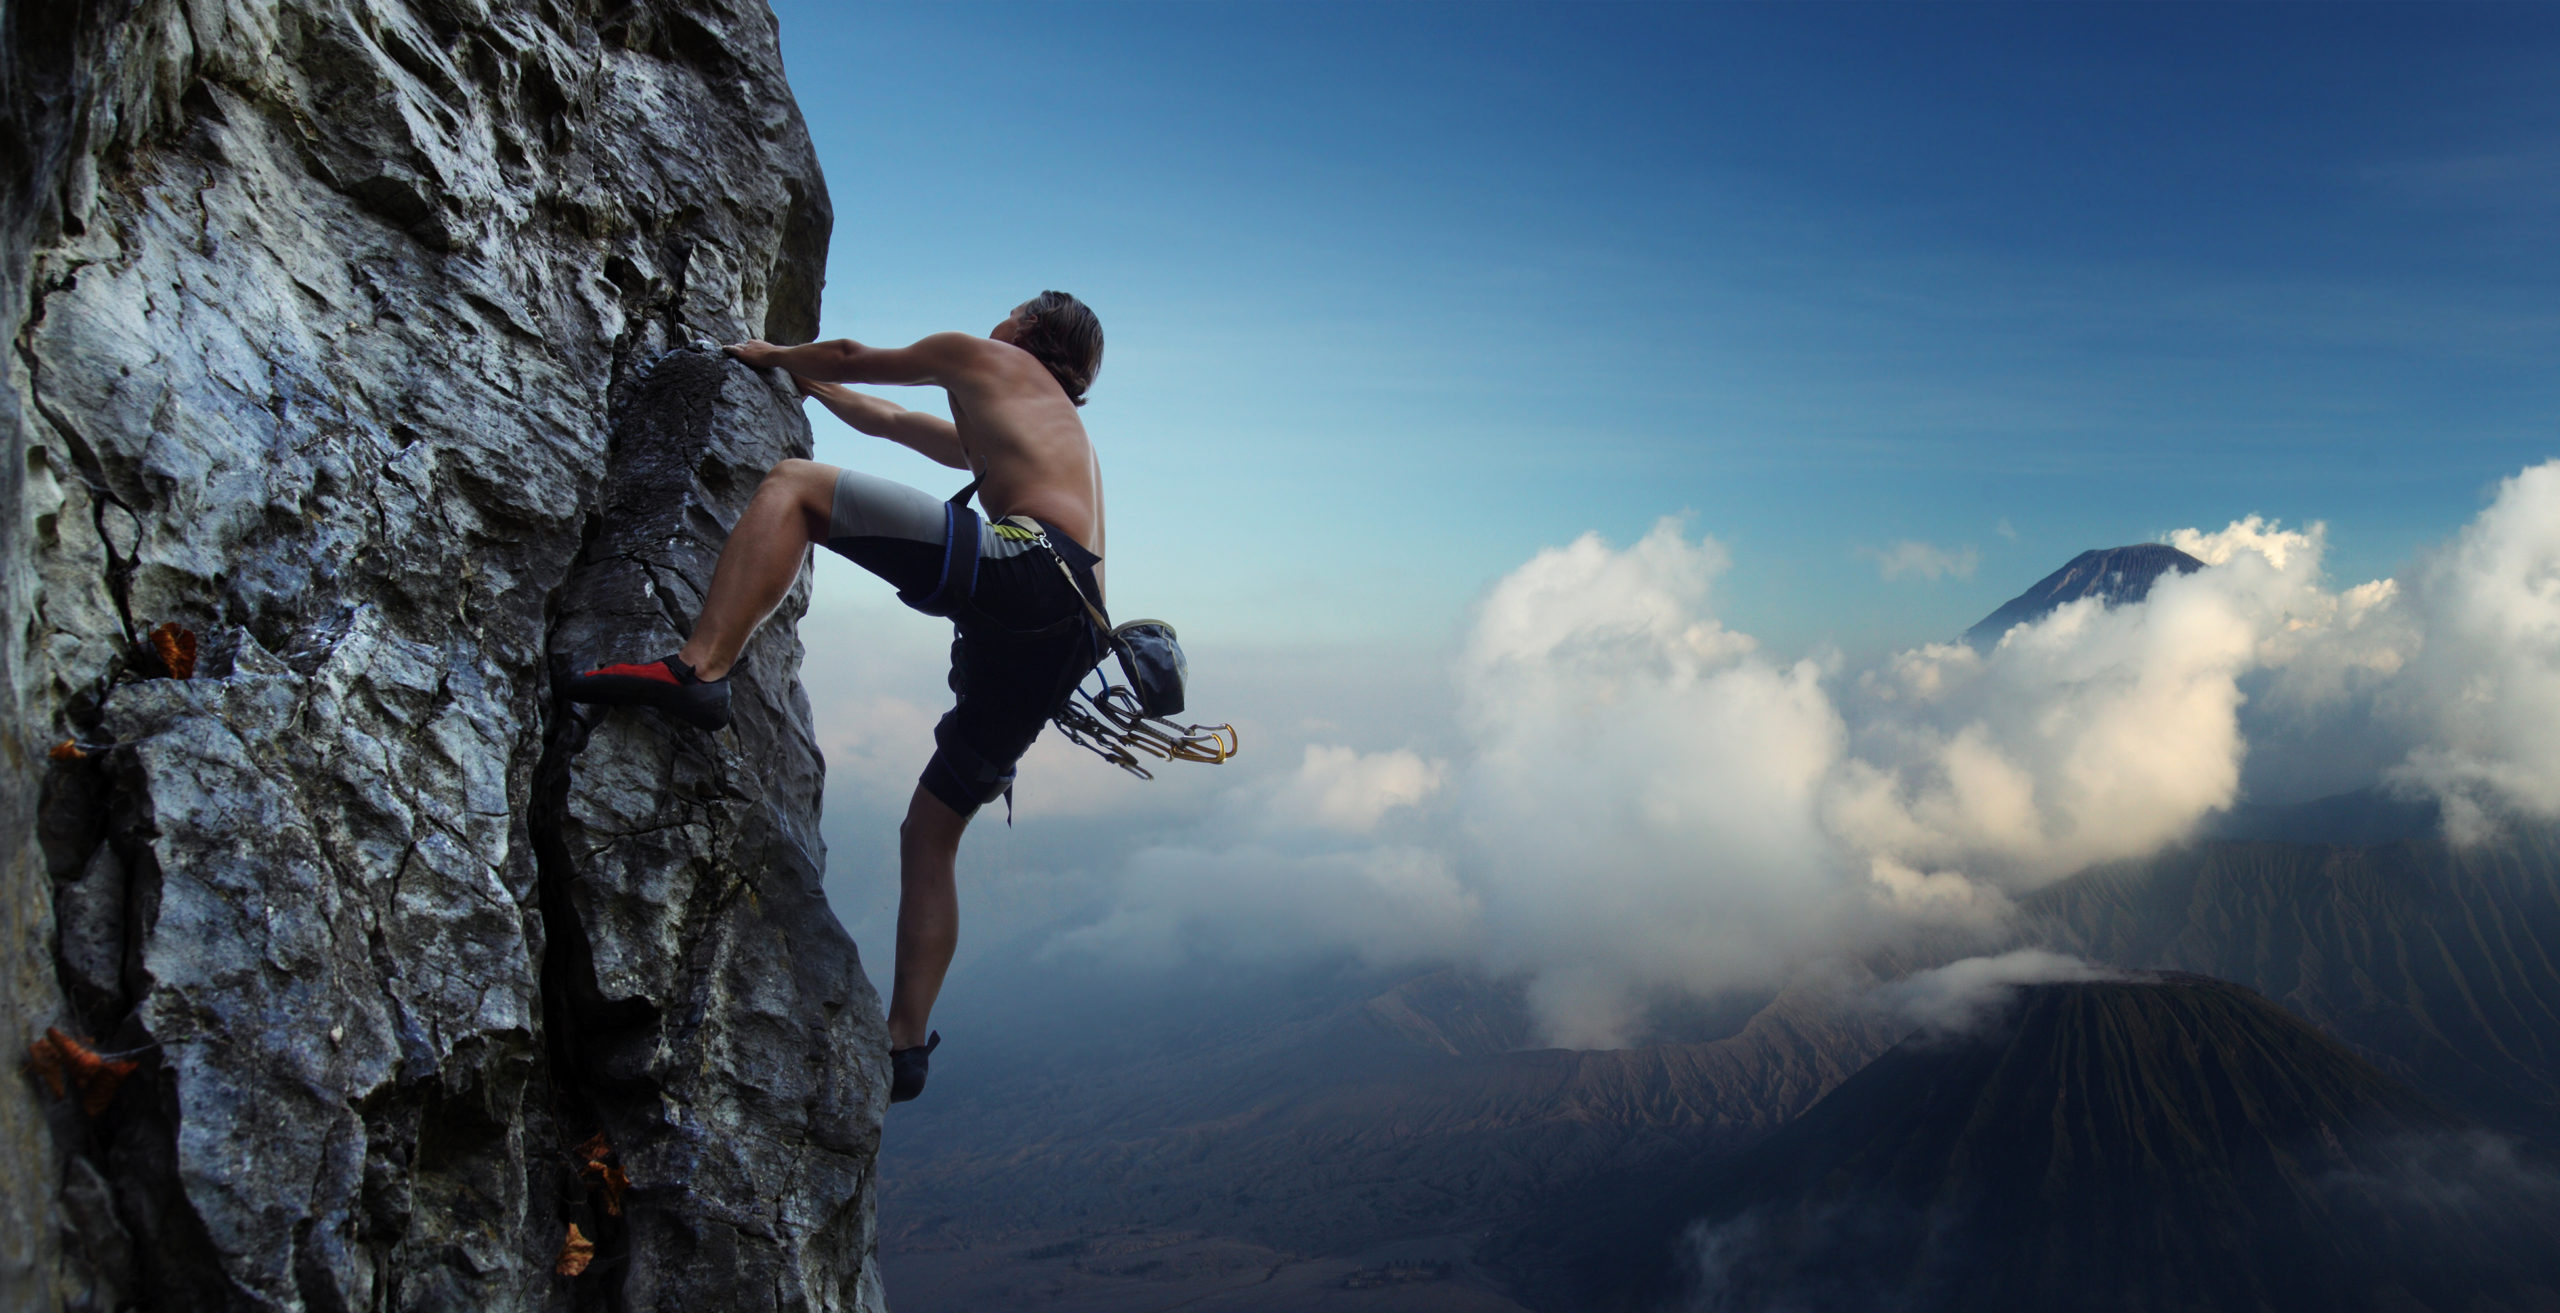 Climbing stile quote